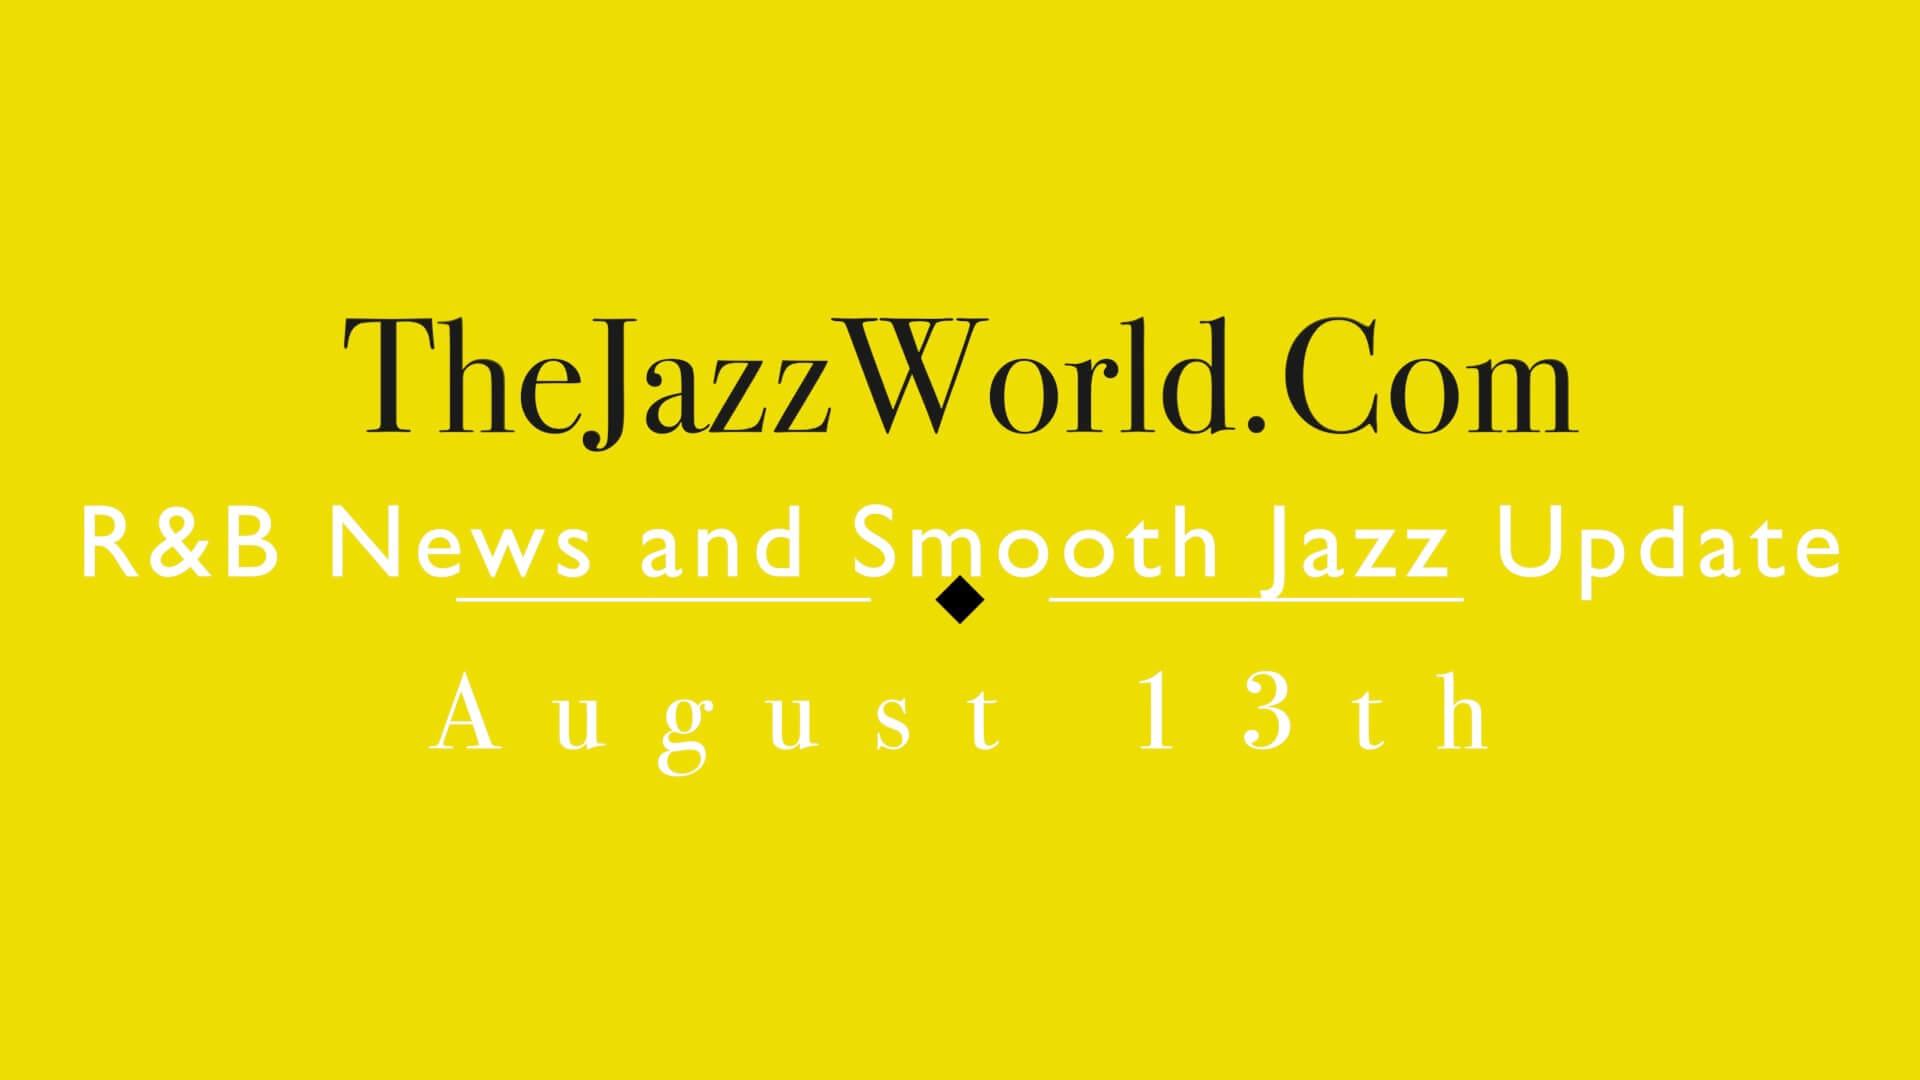 The Jazz World Show 8:13